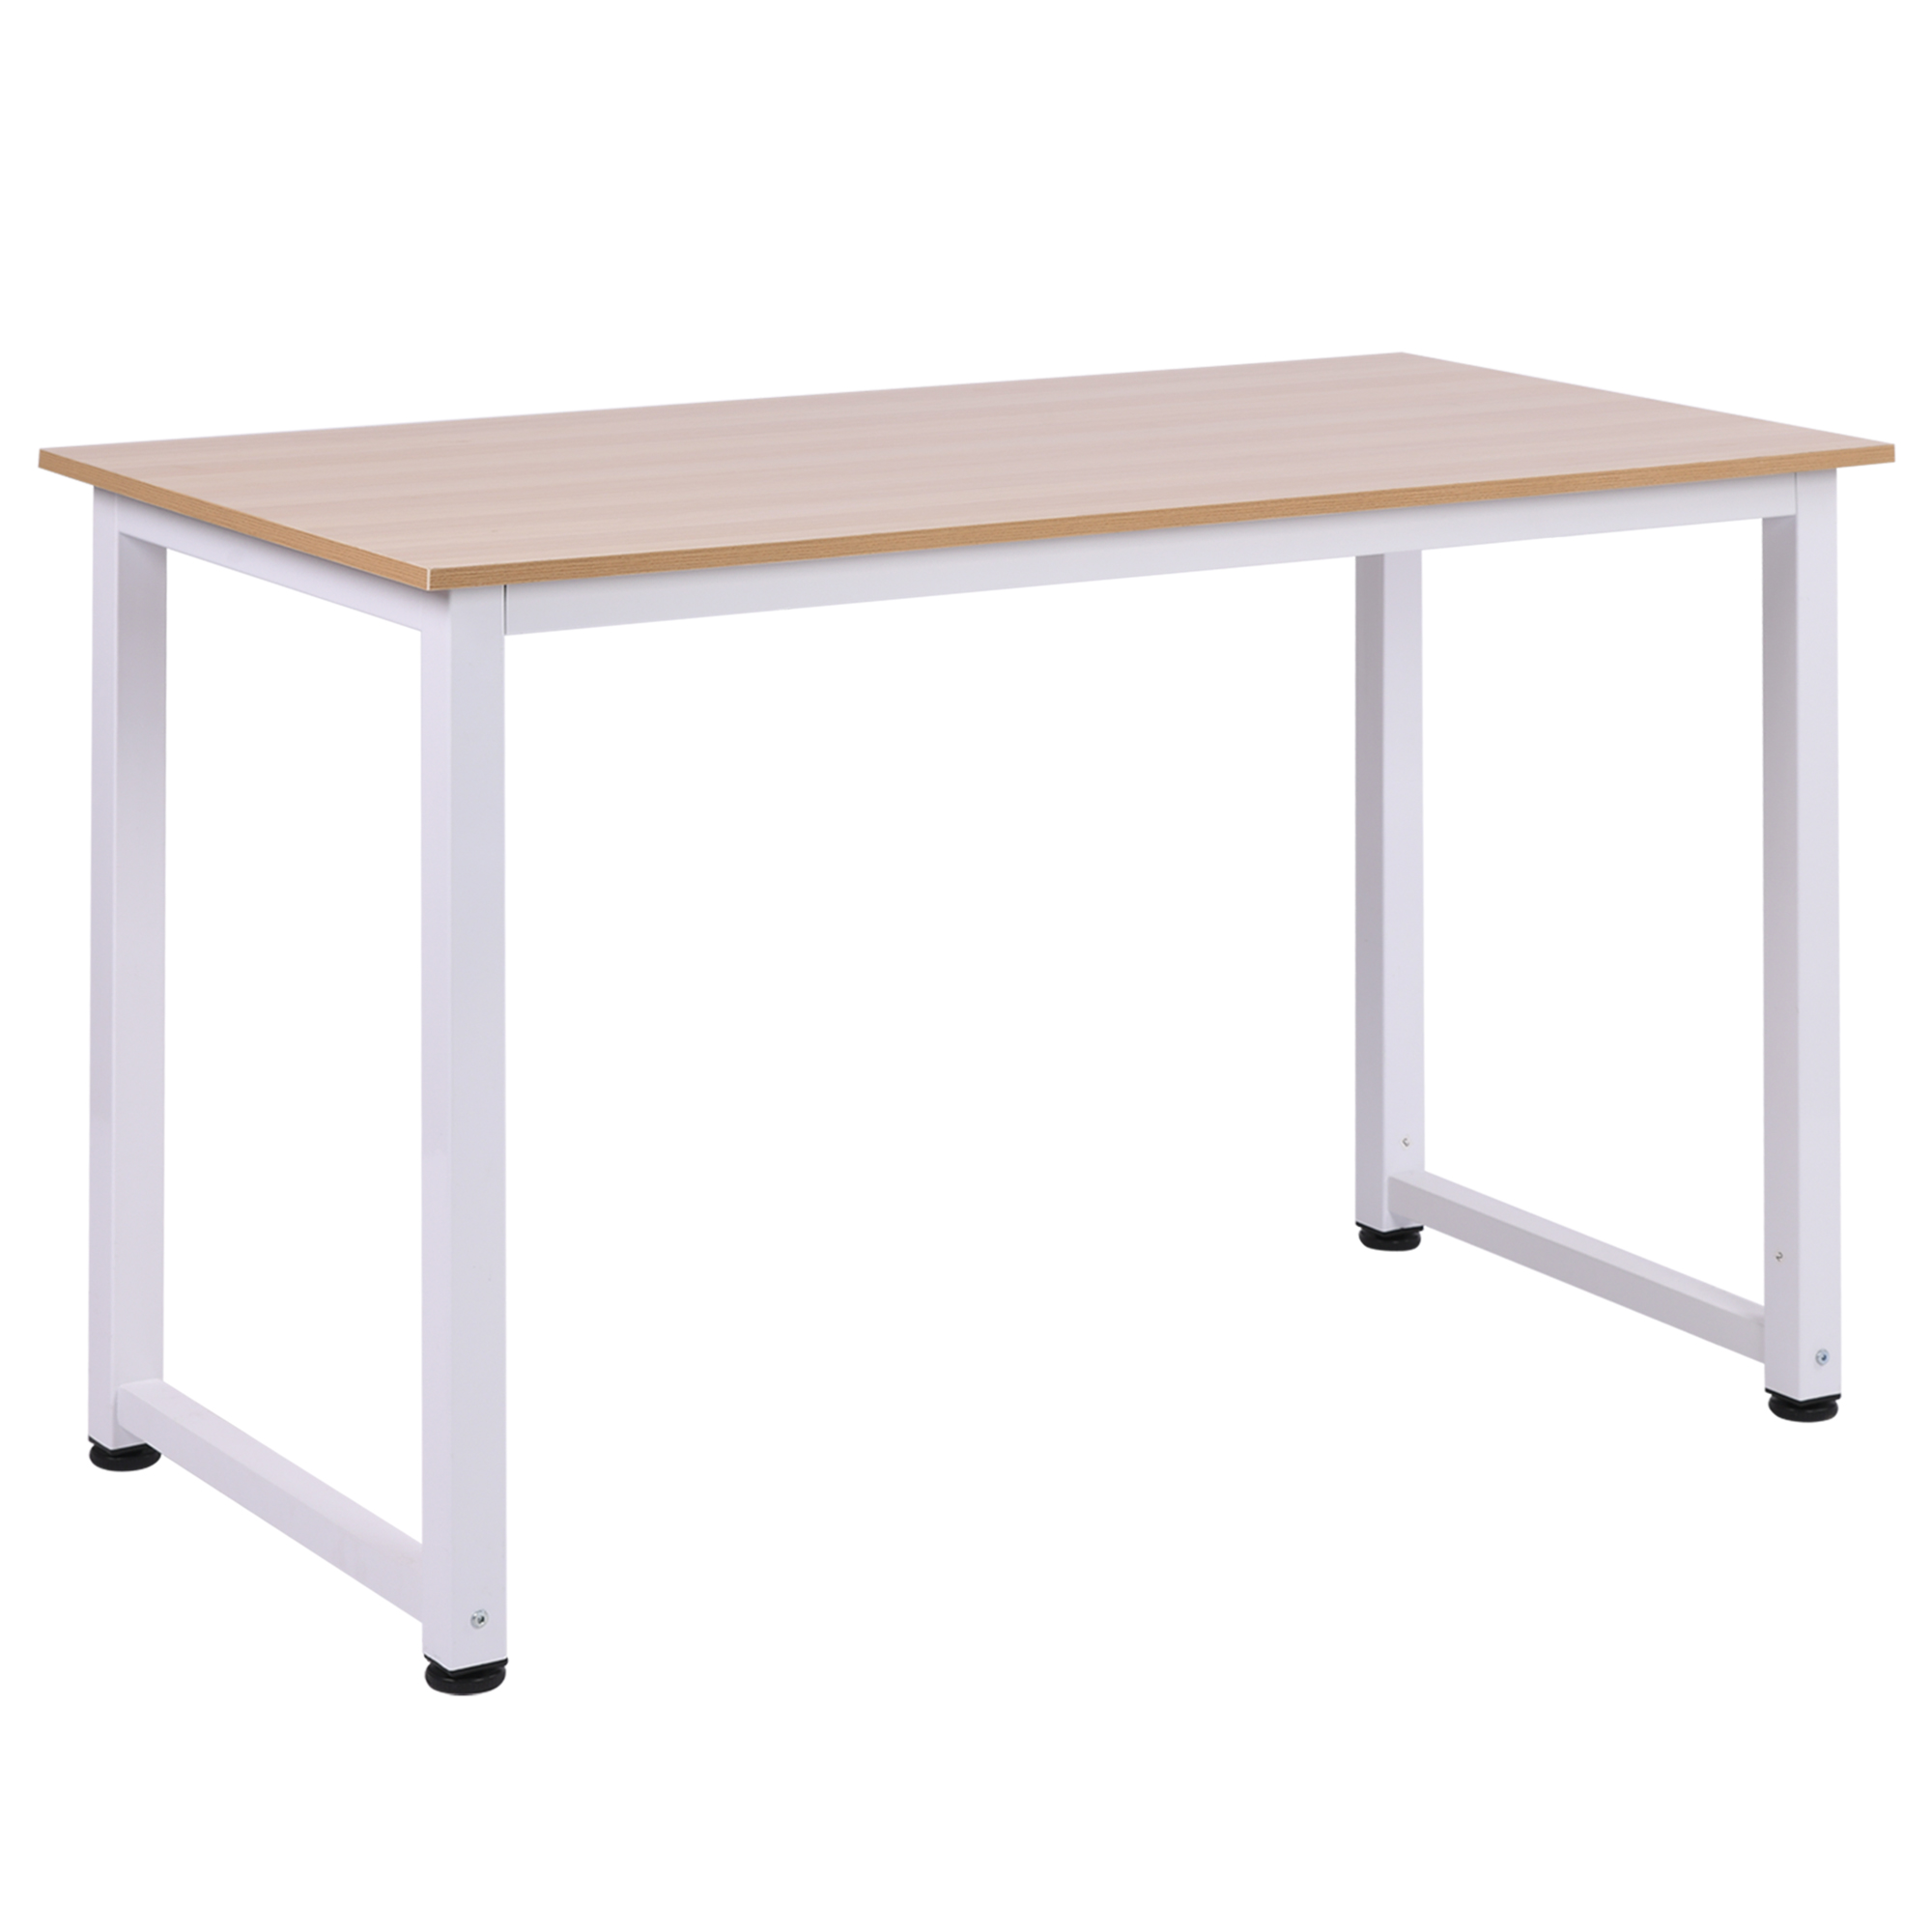 miniatura 3 - Mesa de Ordenador Escritorio para Hogar Oficina Pies Ajustables 120x60x76cm